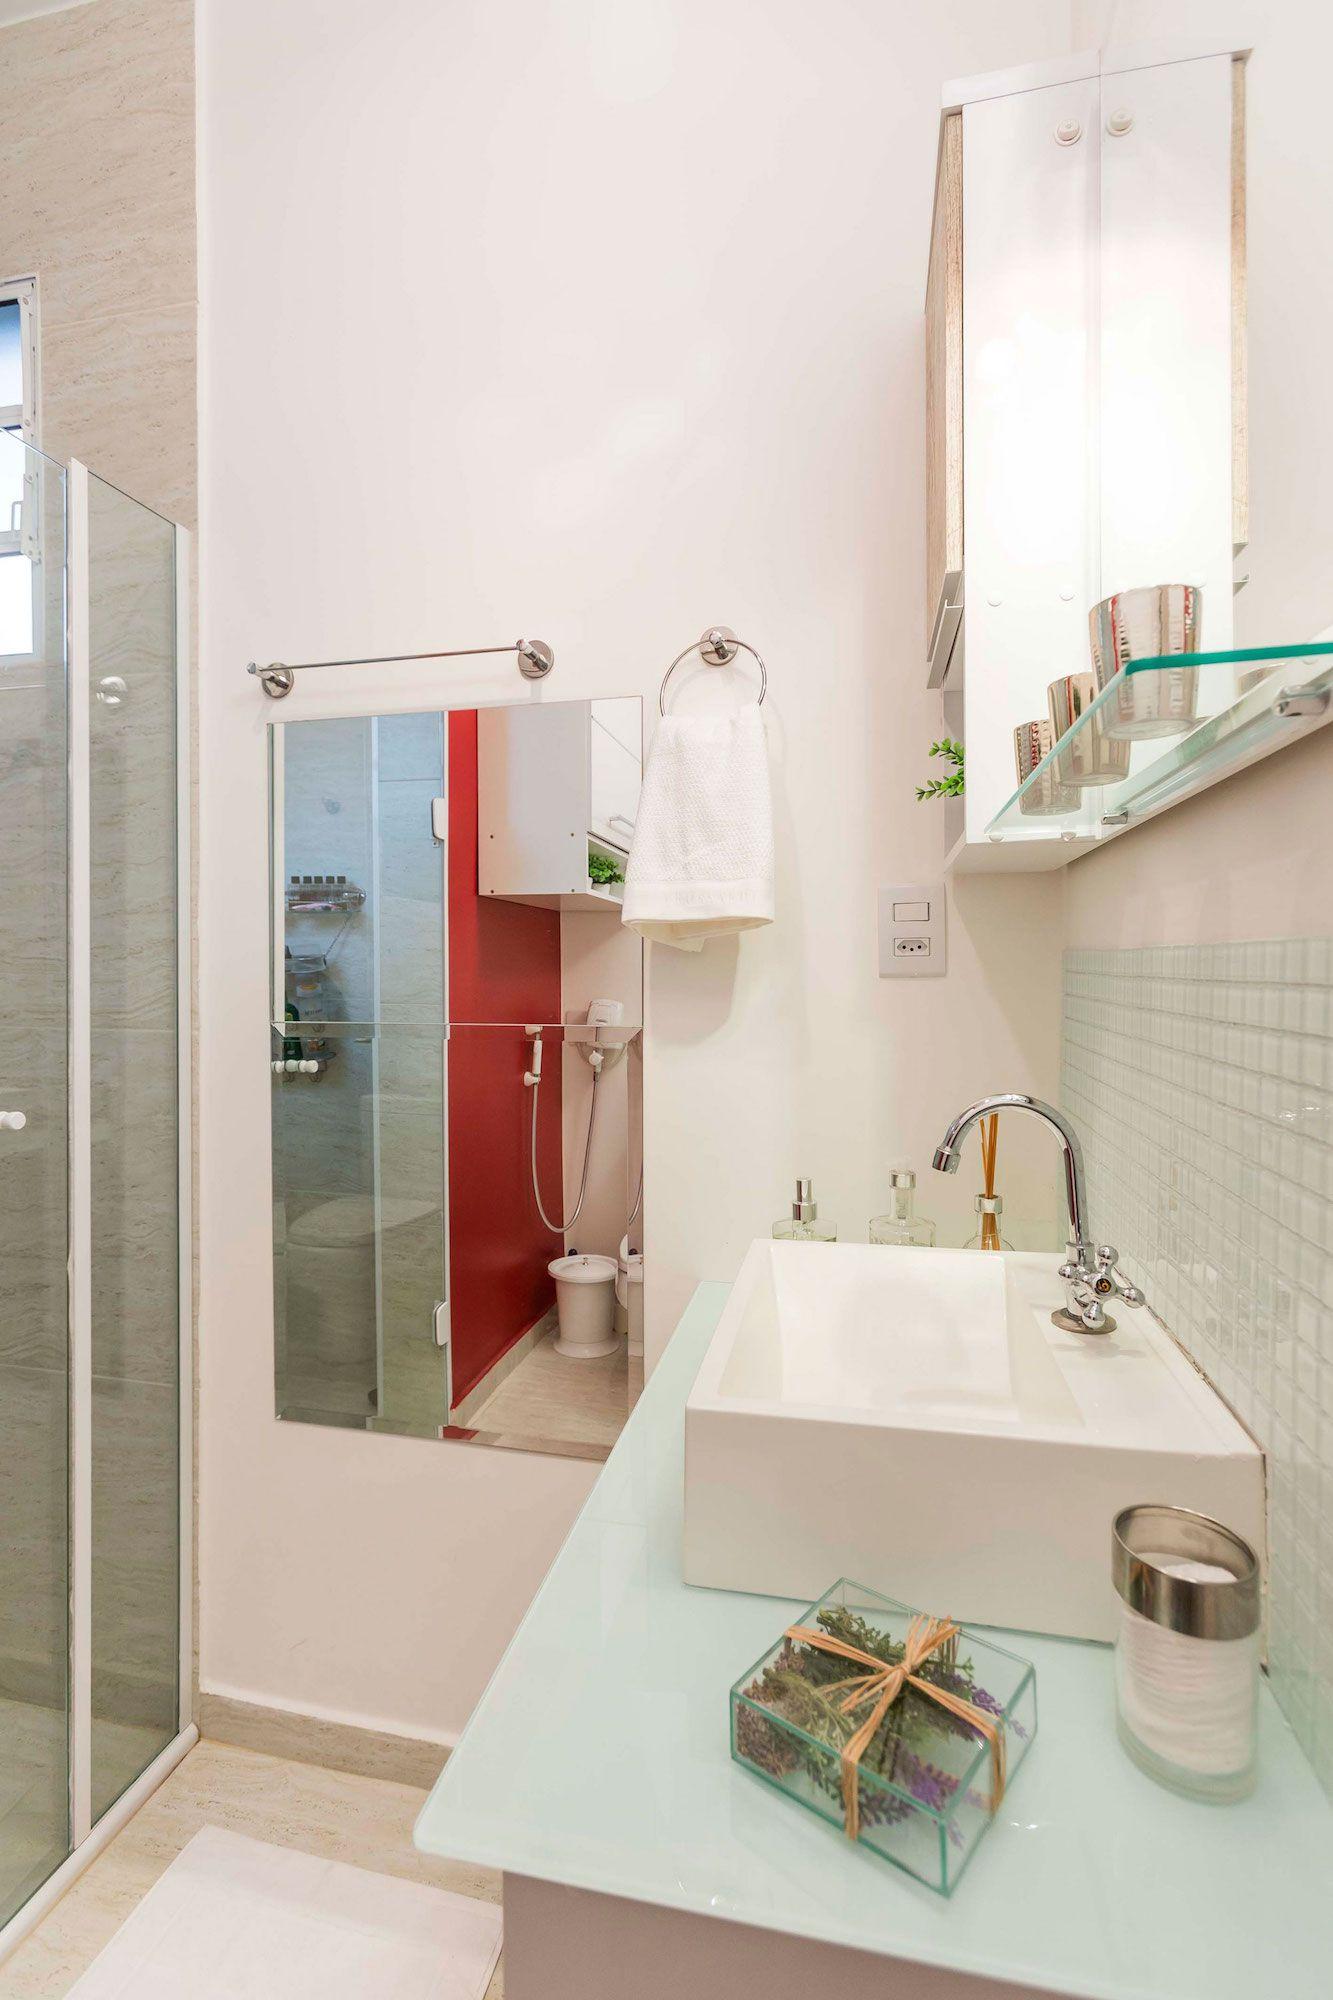 Granja-Julieta-Residence-32